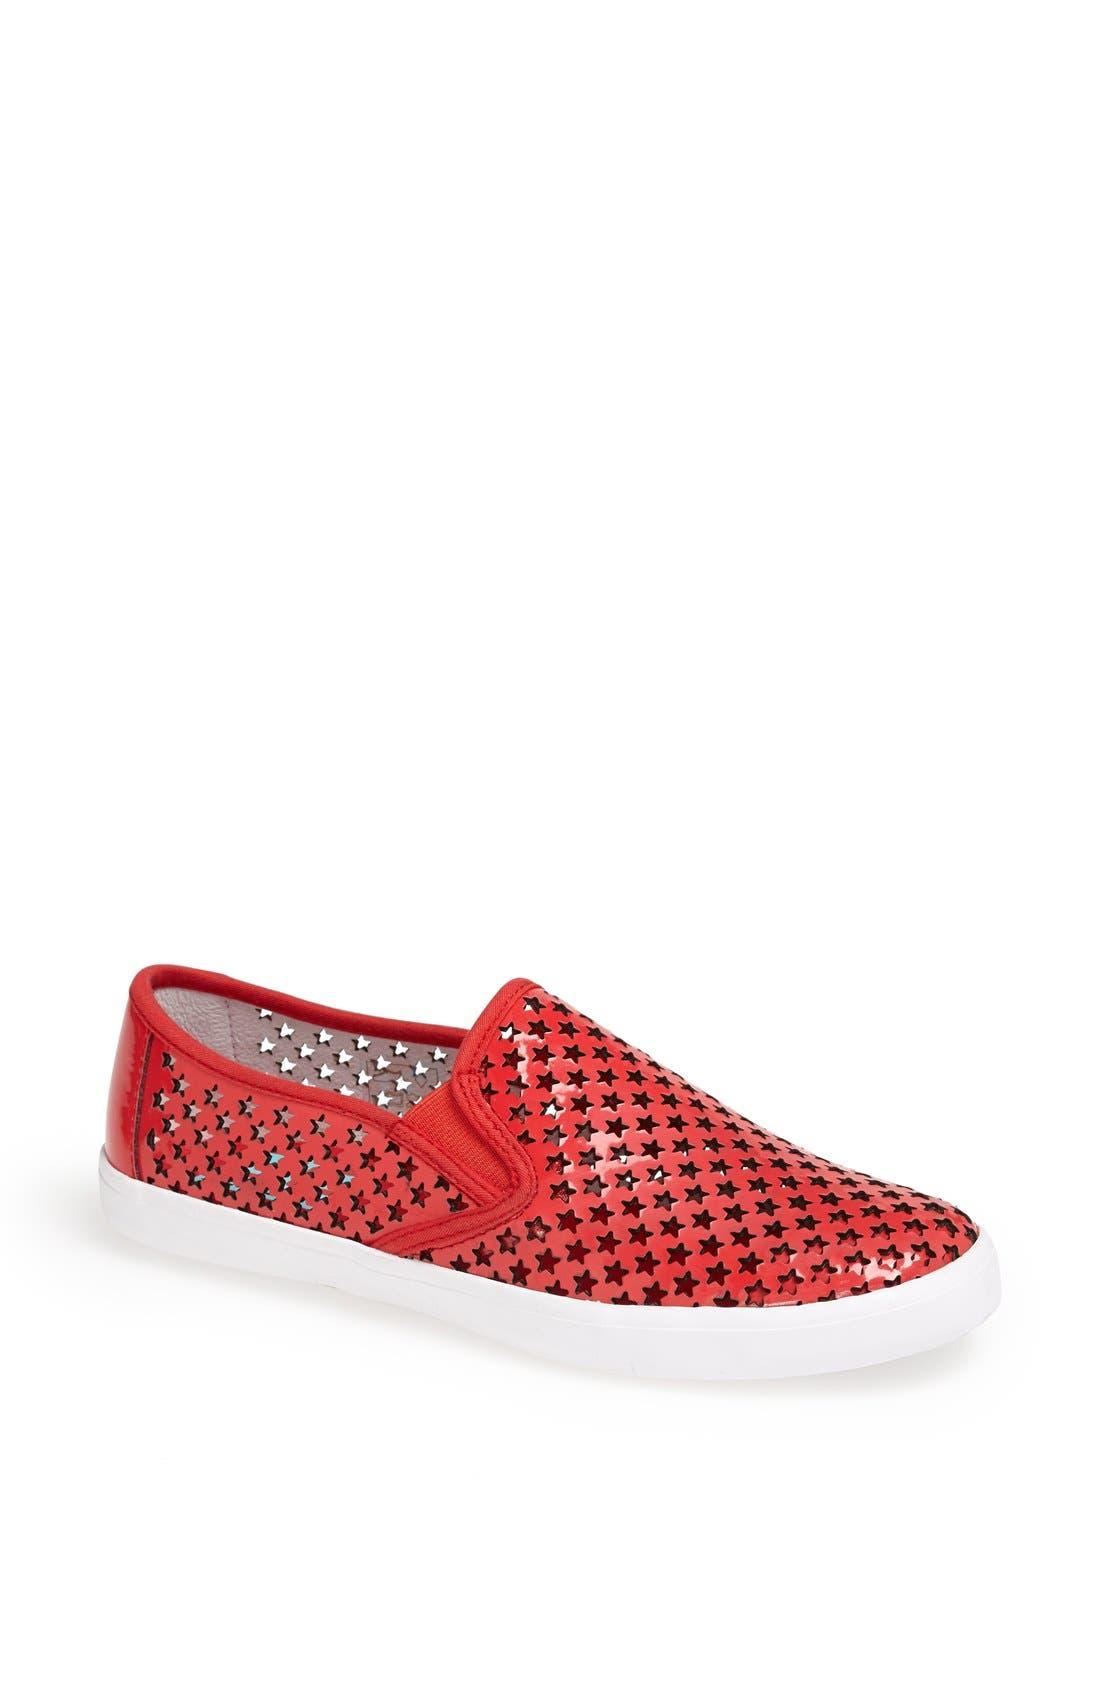 Alternate Image 1 Selected - Jeffrey Campbell 'Dougray' Patent Cutout Slip-On Sneaker